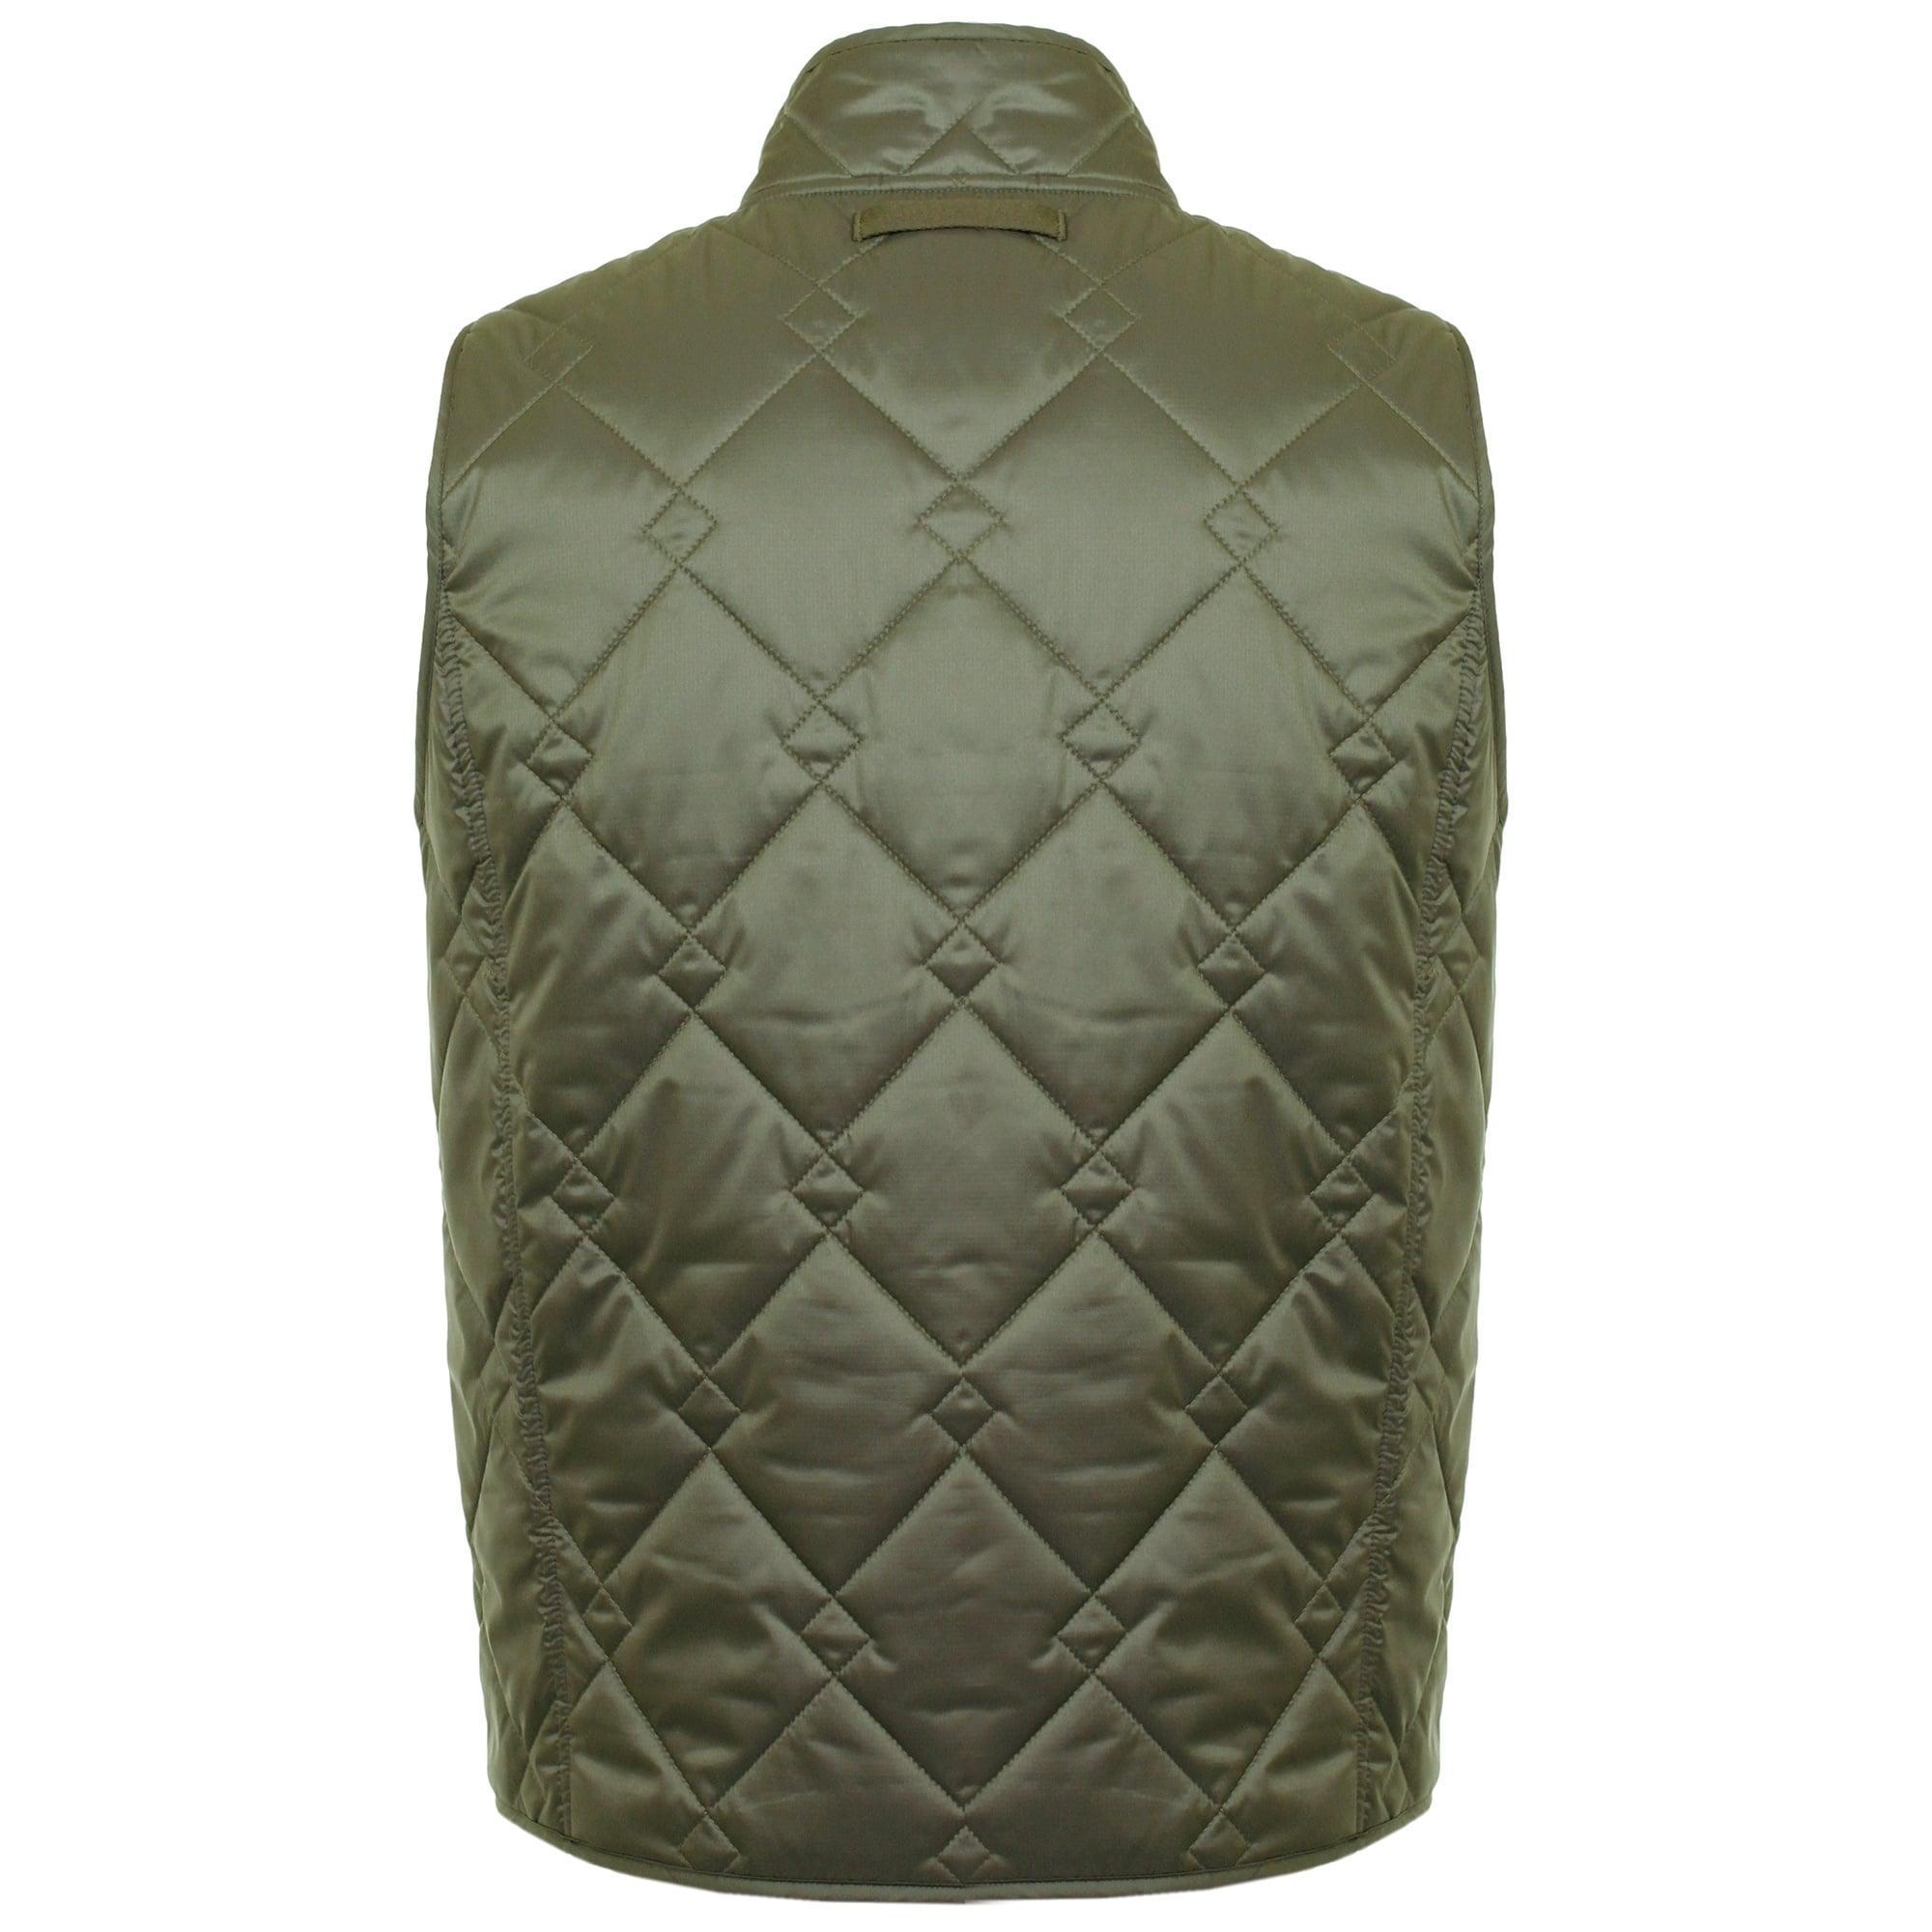 Baracuta Synthetic Shoreditch Modular Military Green Vest 02Brmow0120Frp01 for Men